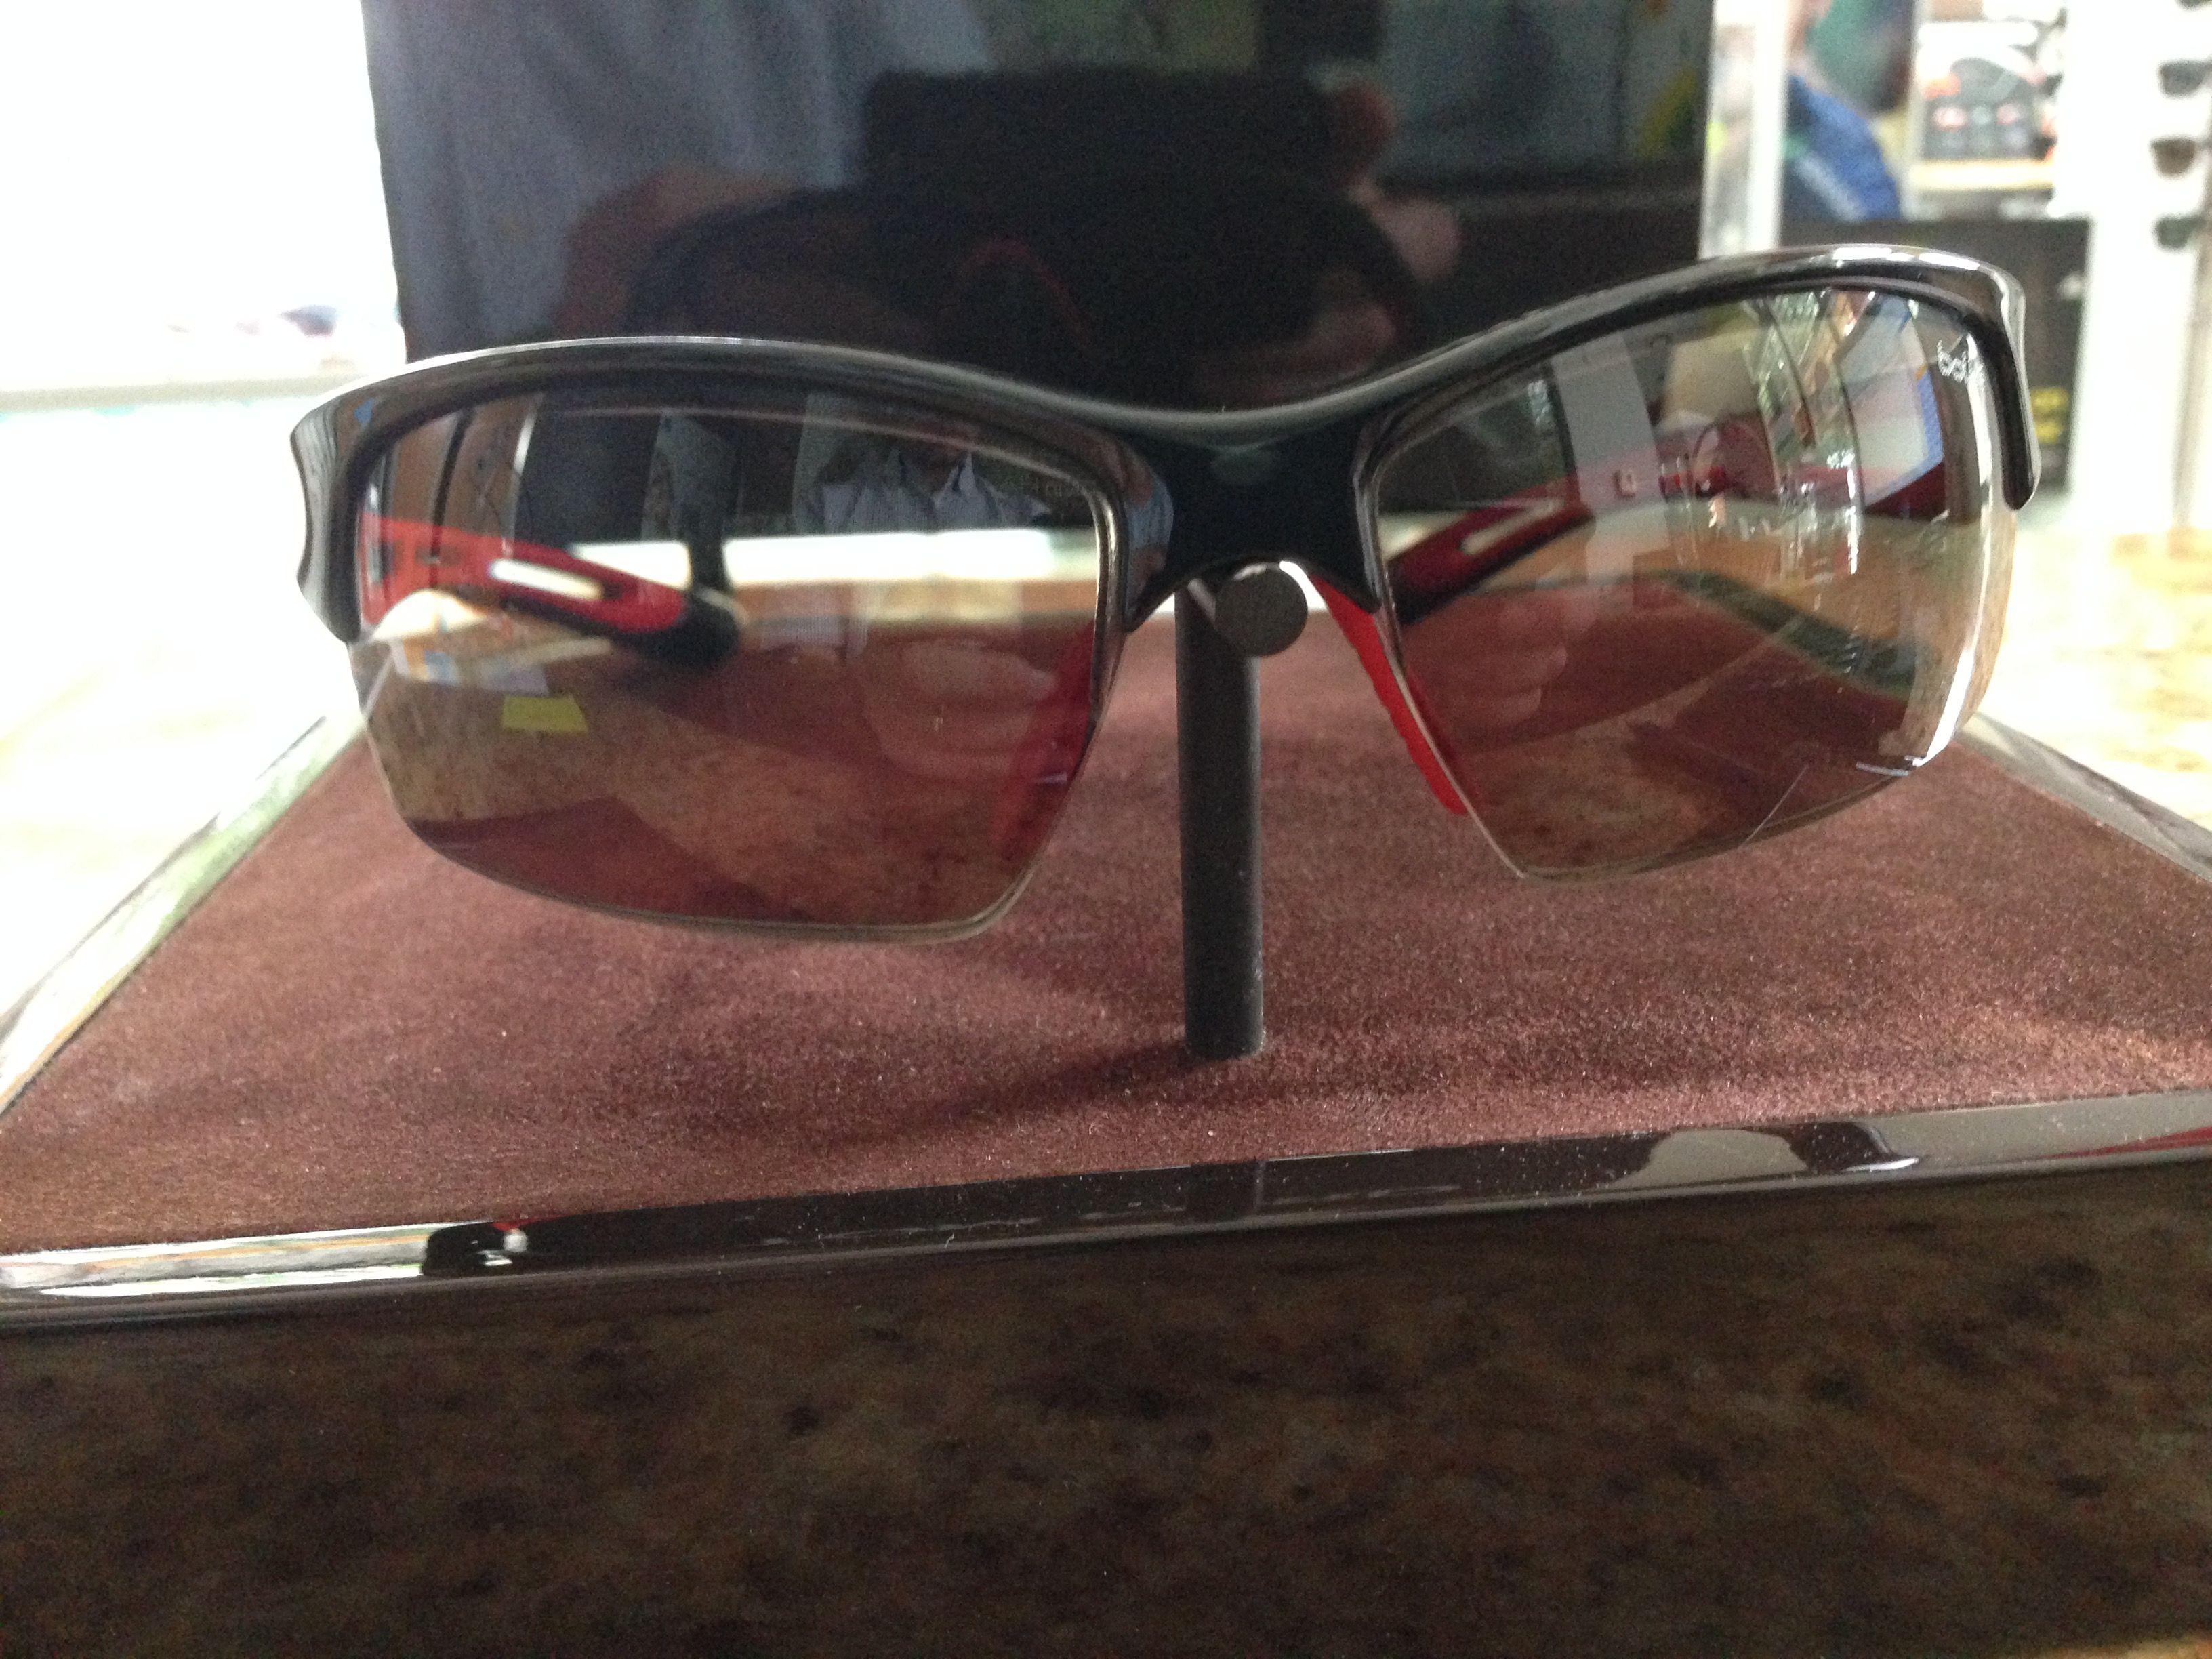 bcca9fd2c2 Gafas graduadas Bolle Bolt S (negra con lentes gris verde) | OP. SAVIS